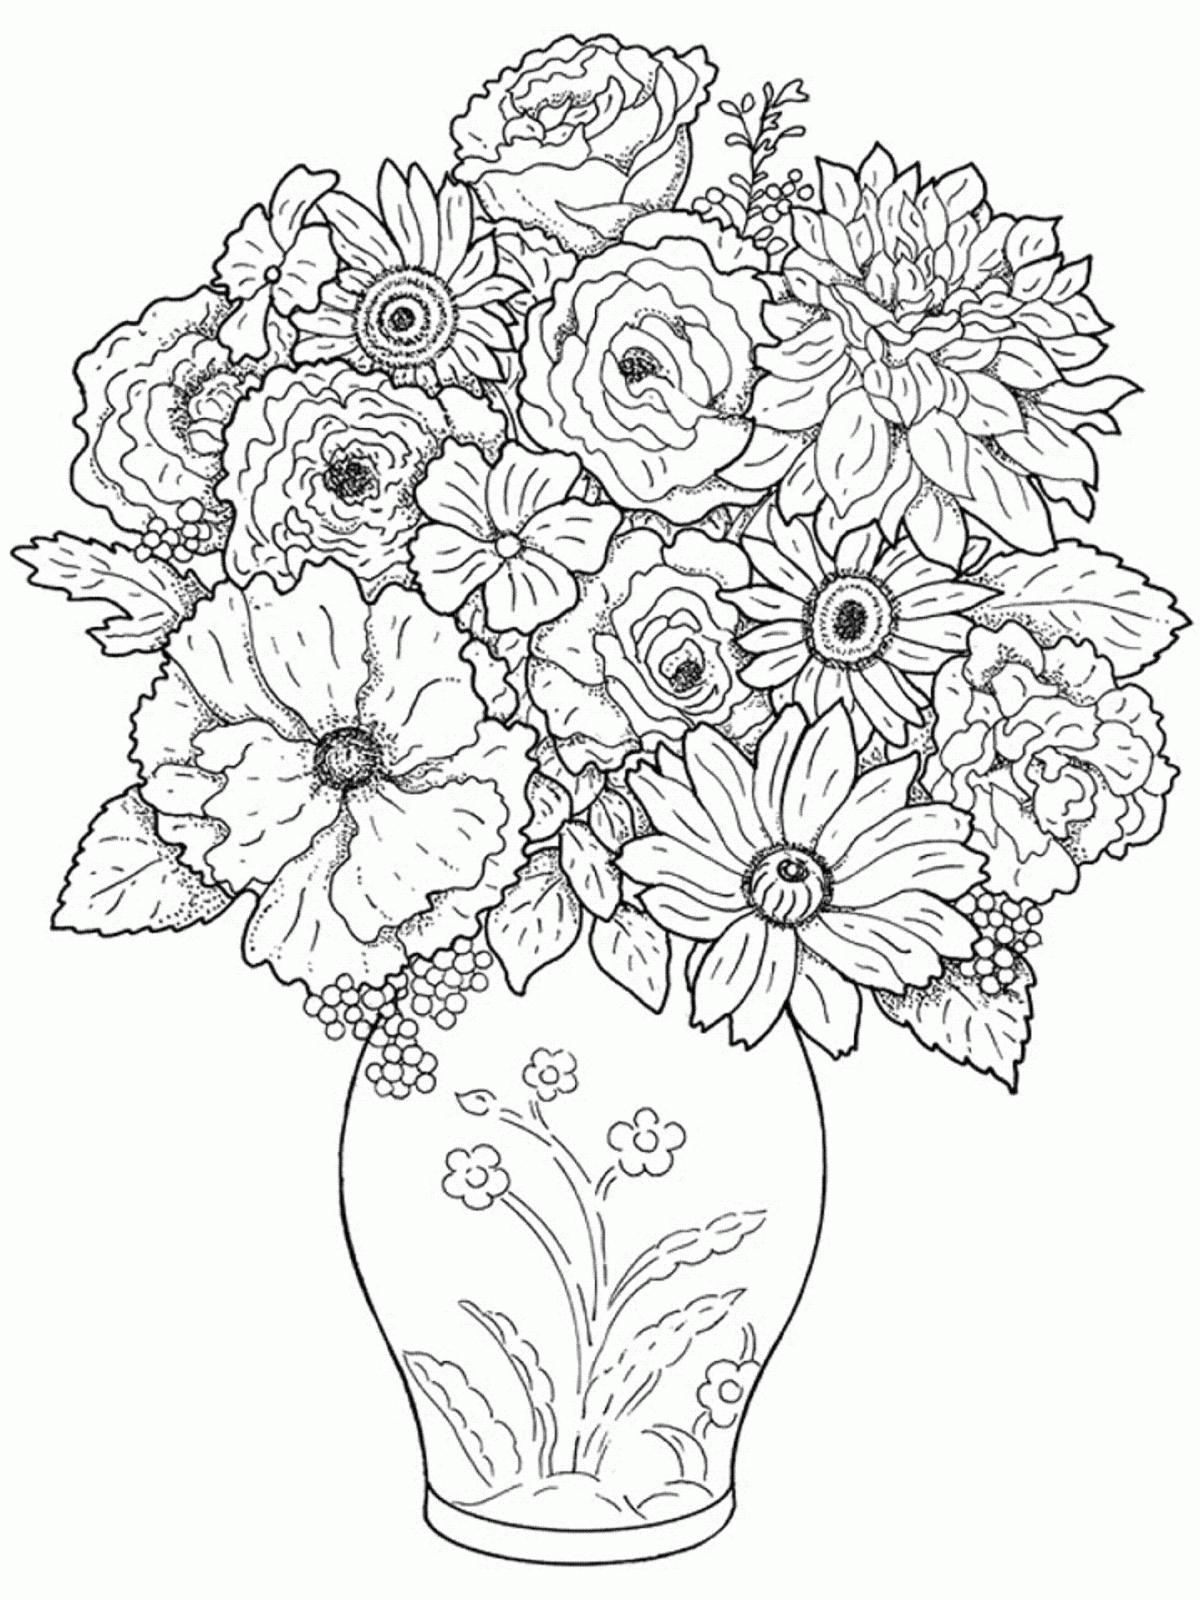 1200x1600 Hd Pencil Drawings Of Flower Pot Designs Drawings Of A Flower Pot